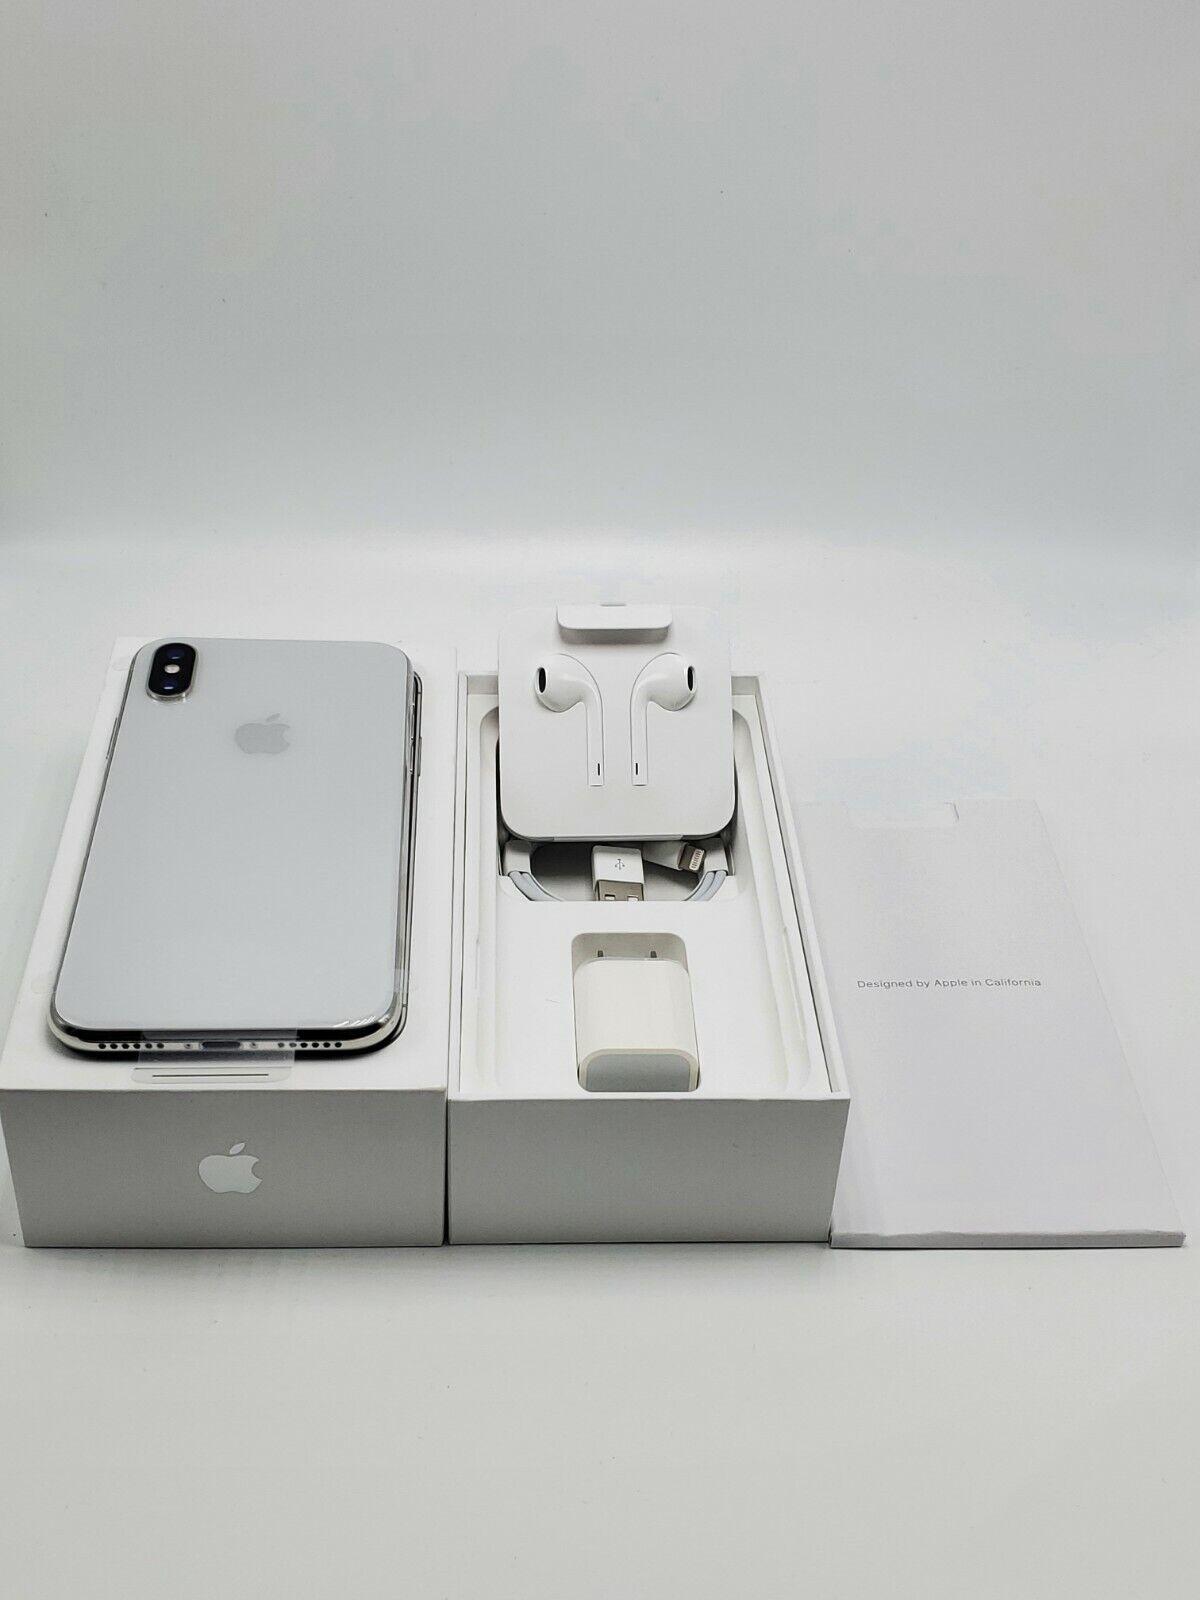 NEW Apple iPhone X - 256 GB - GSM+CDMA Unlocked - Silver A1865 1